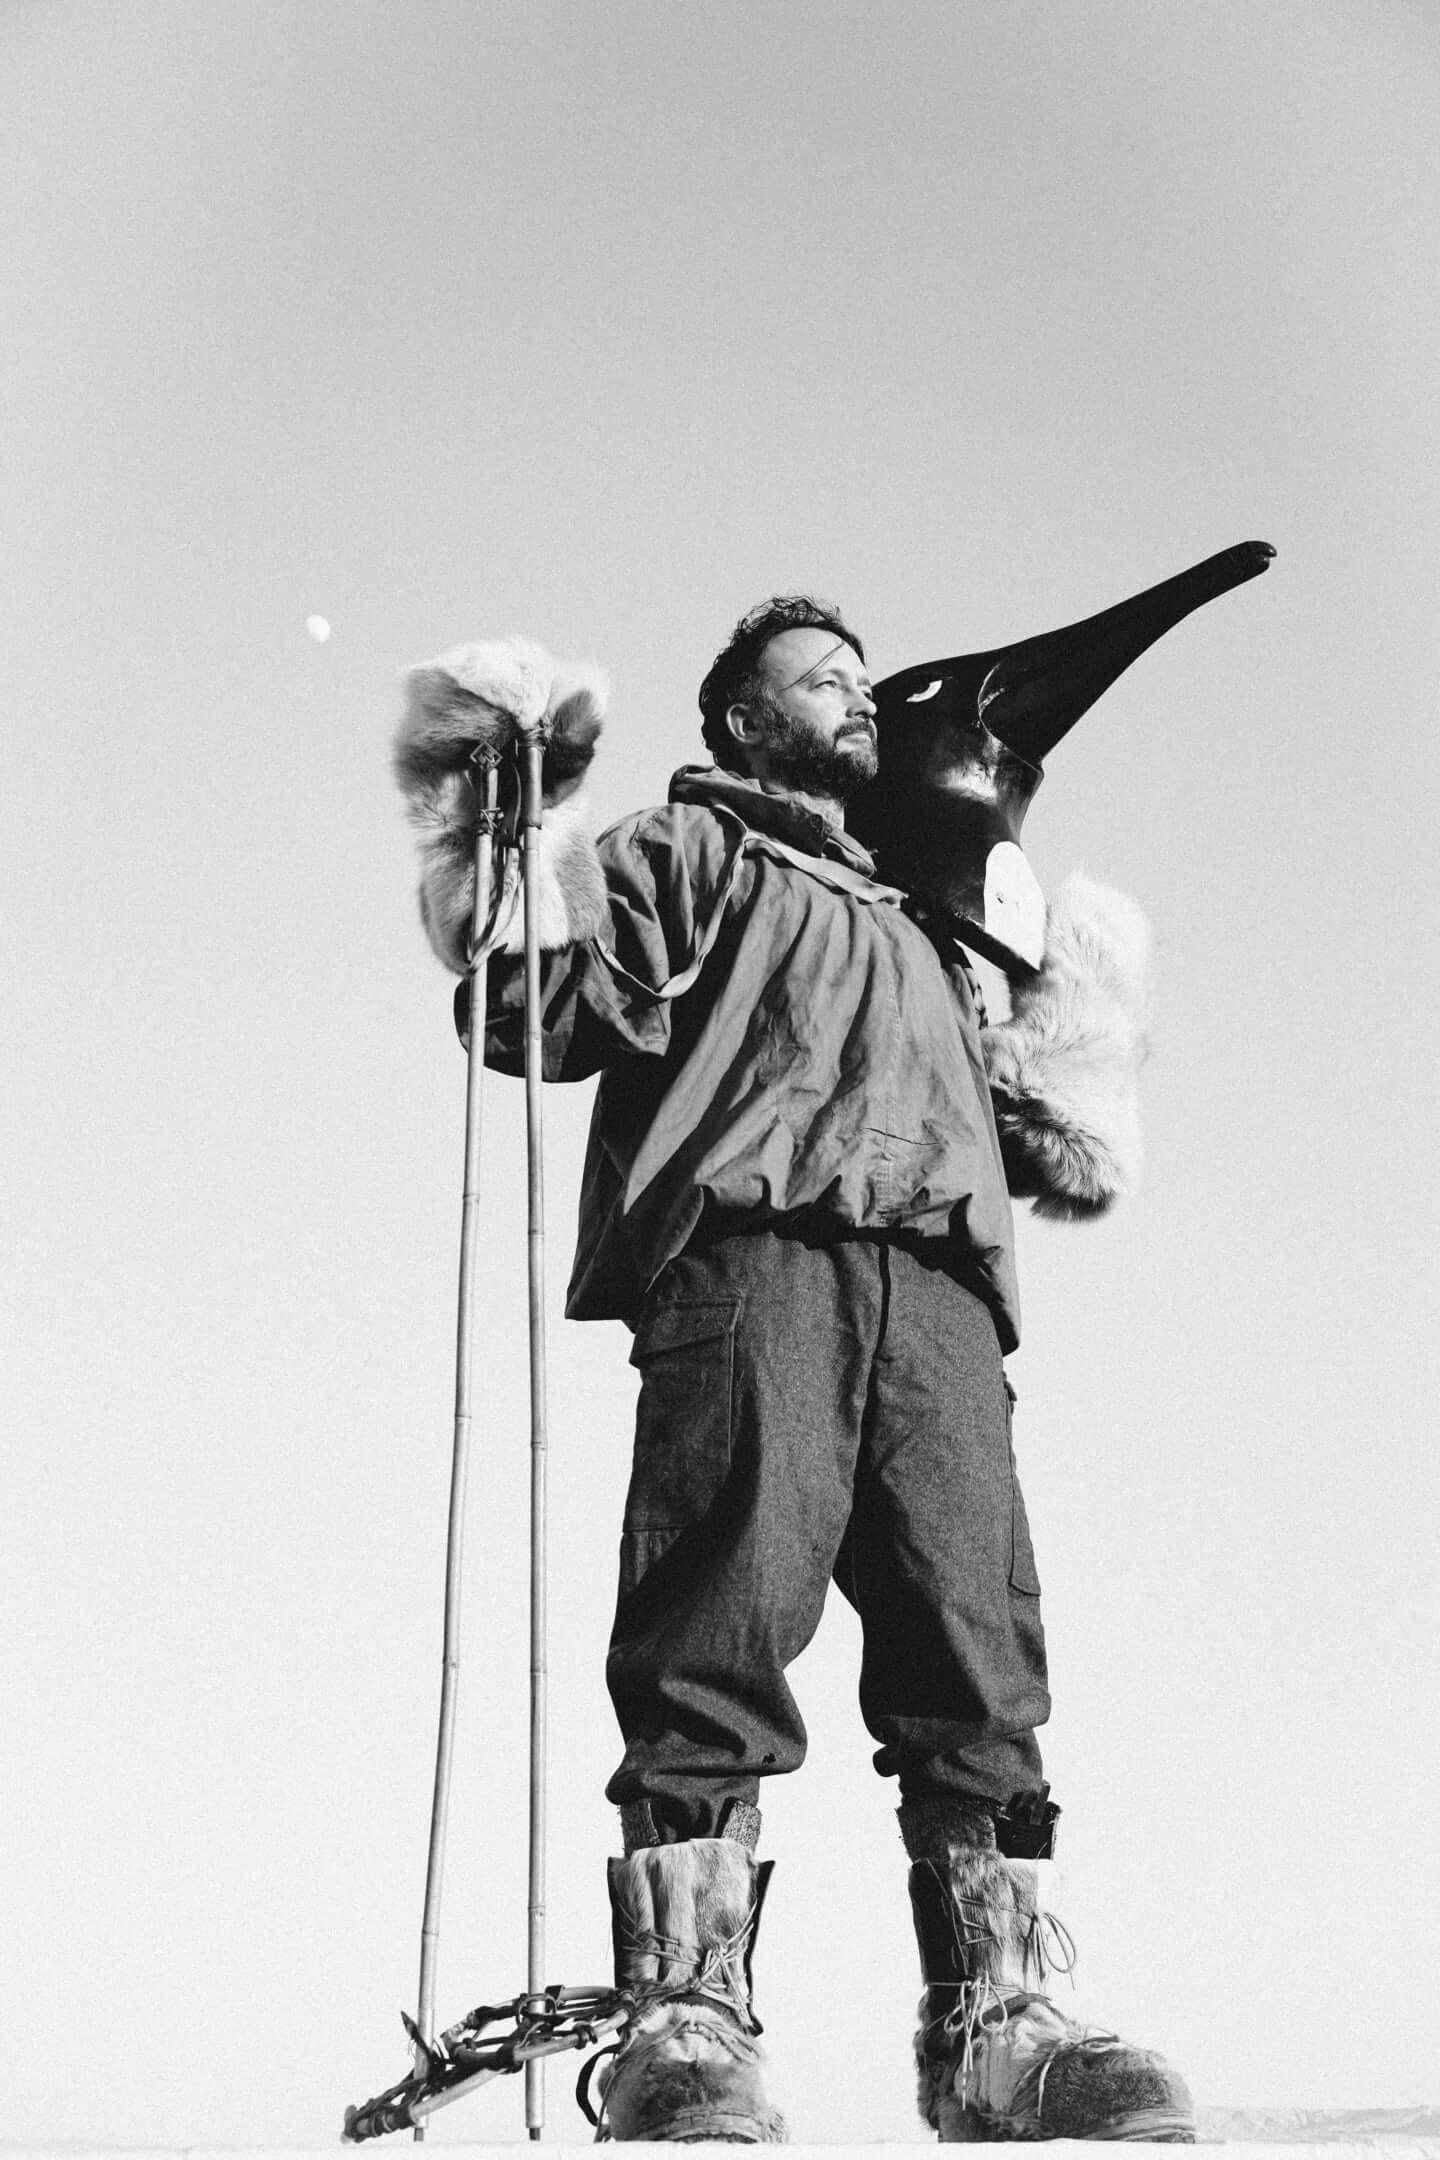 Penguin Cafeインタビュー|南極のペンギン達に捧げた新作『Handfuls Of Night』の世界観を紐解く interview_penguincafe_artist_3-1440x2160